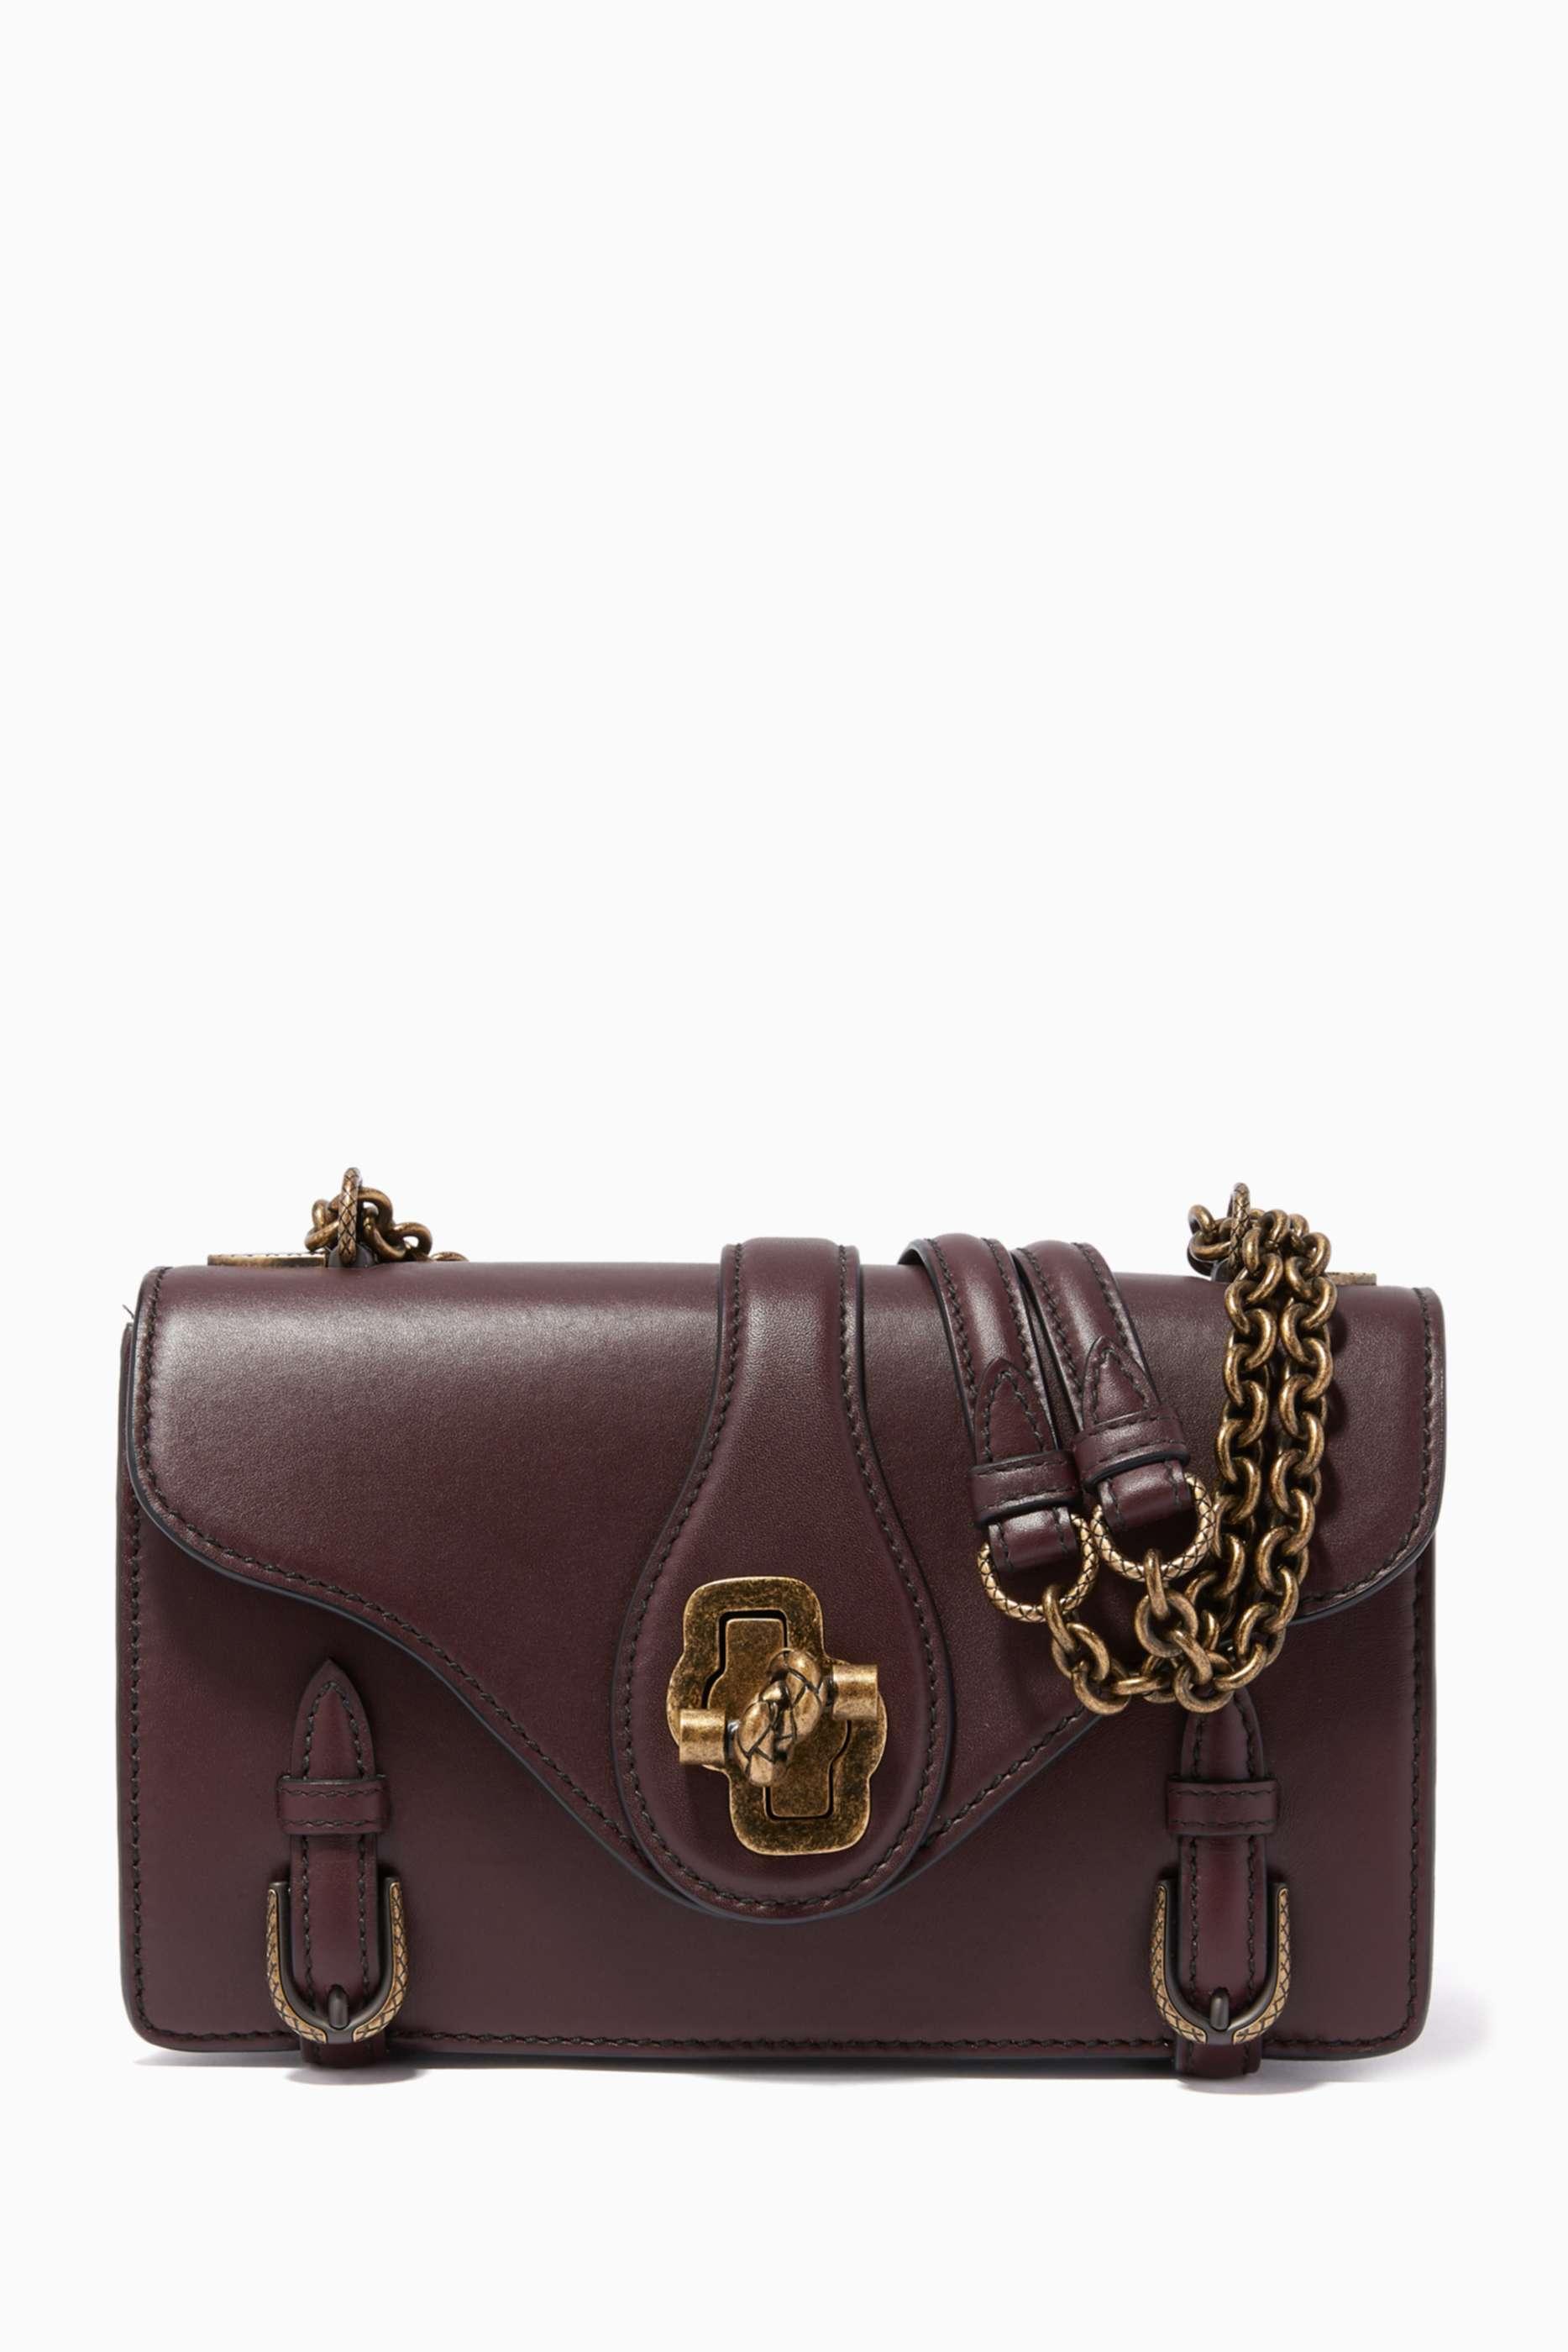 Burgundy City Knot Leather Bag